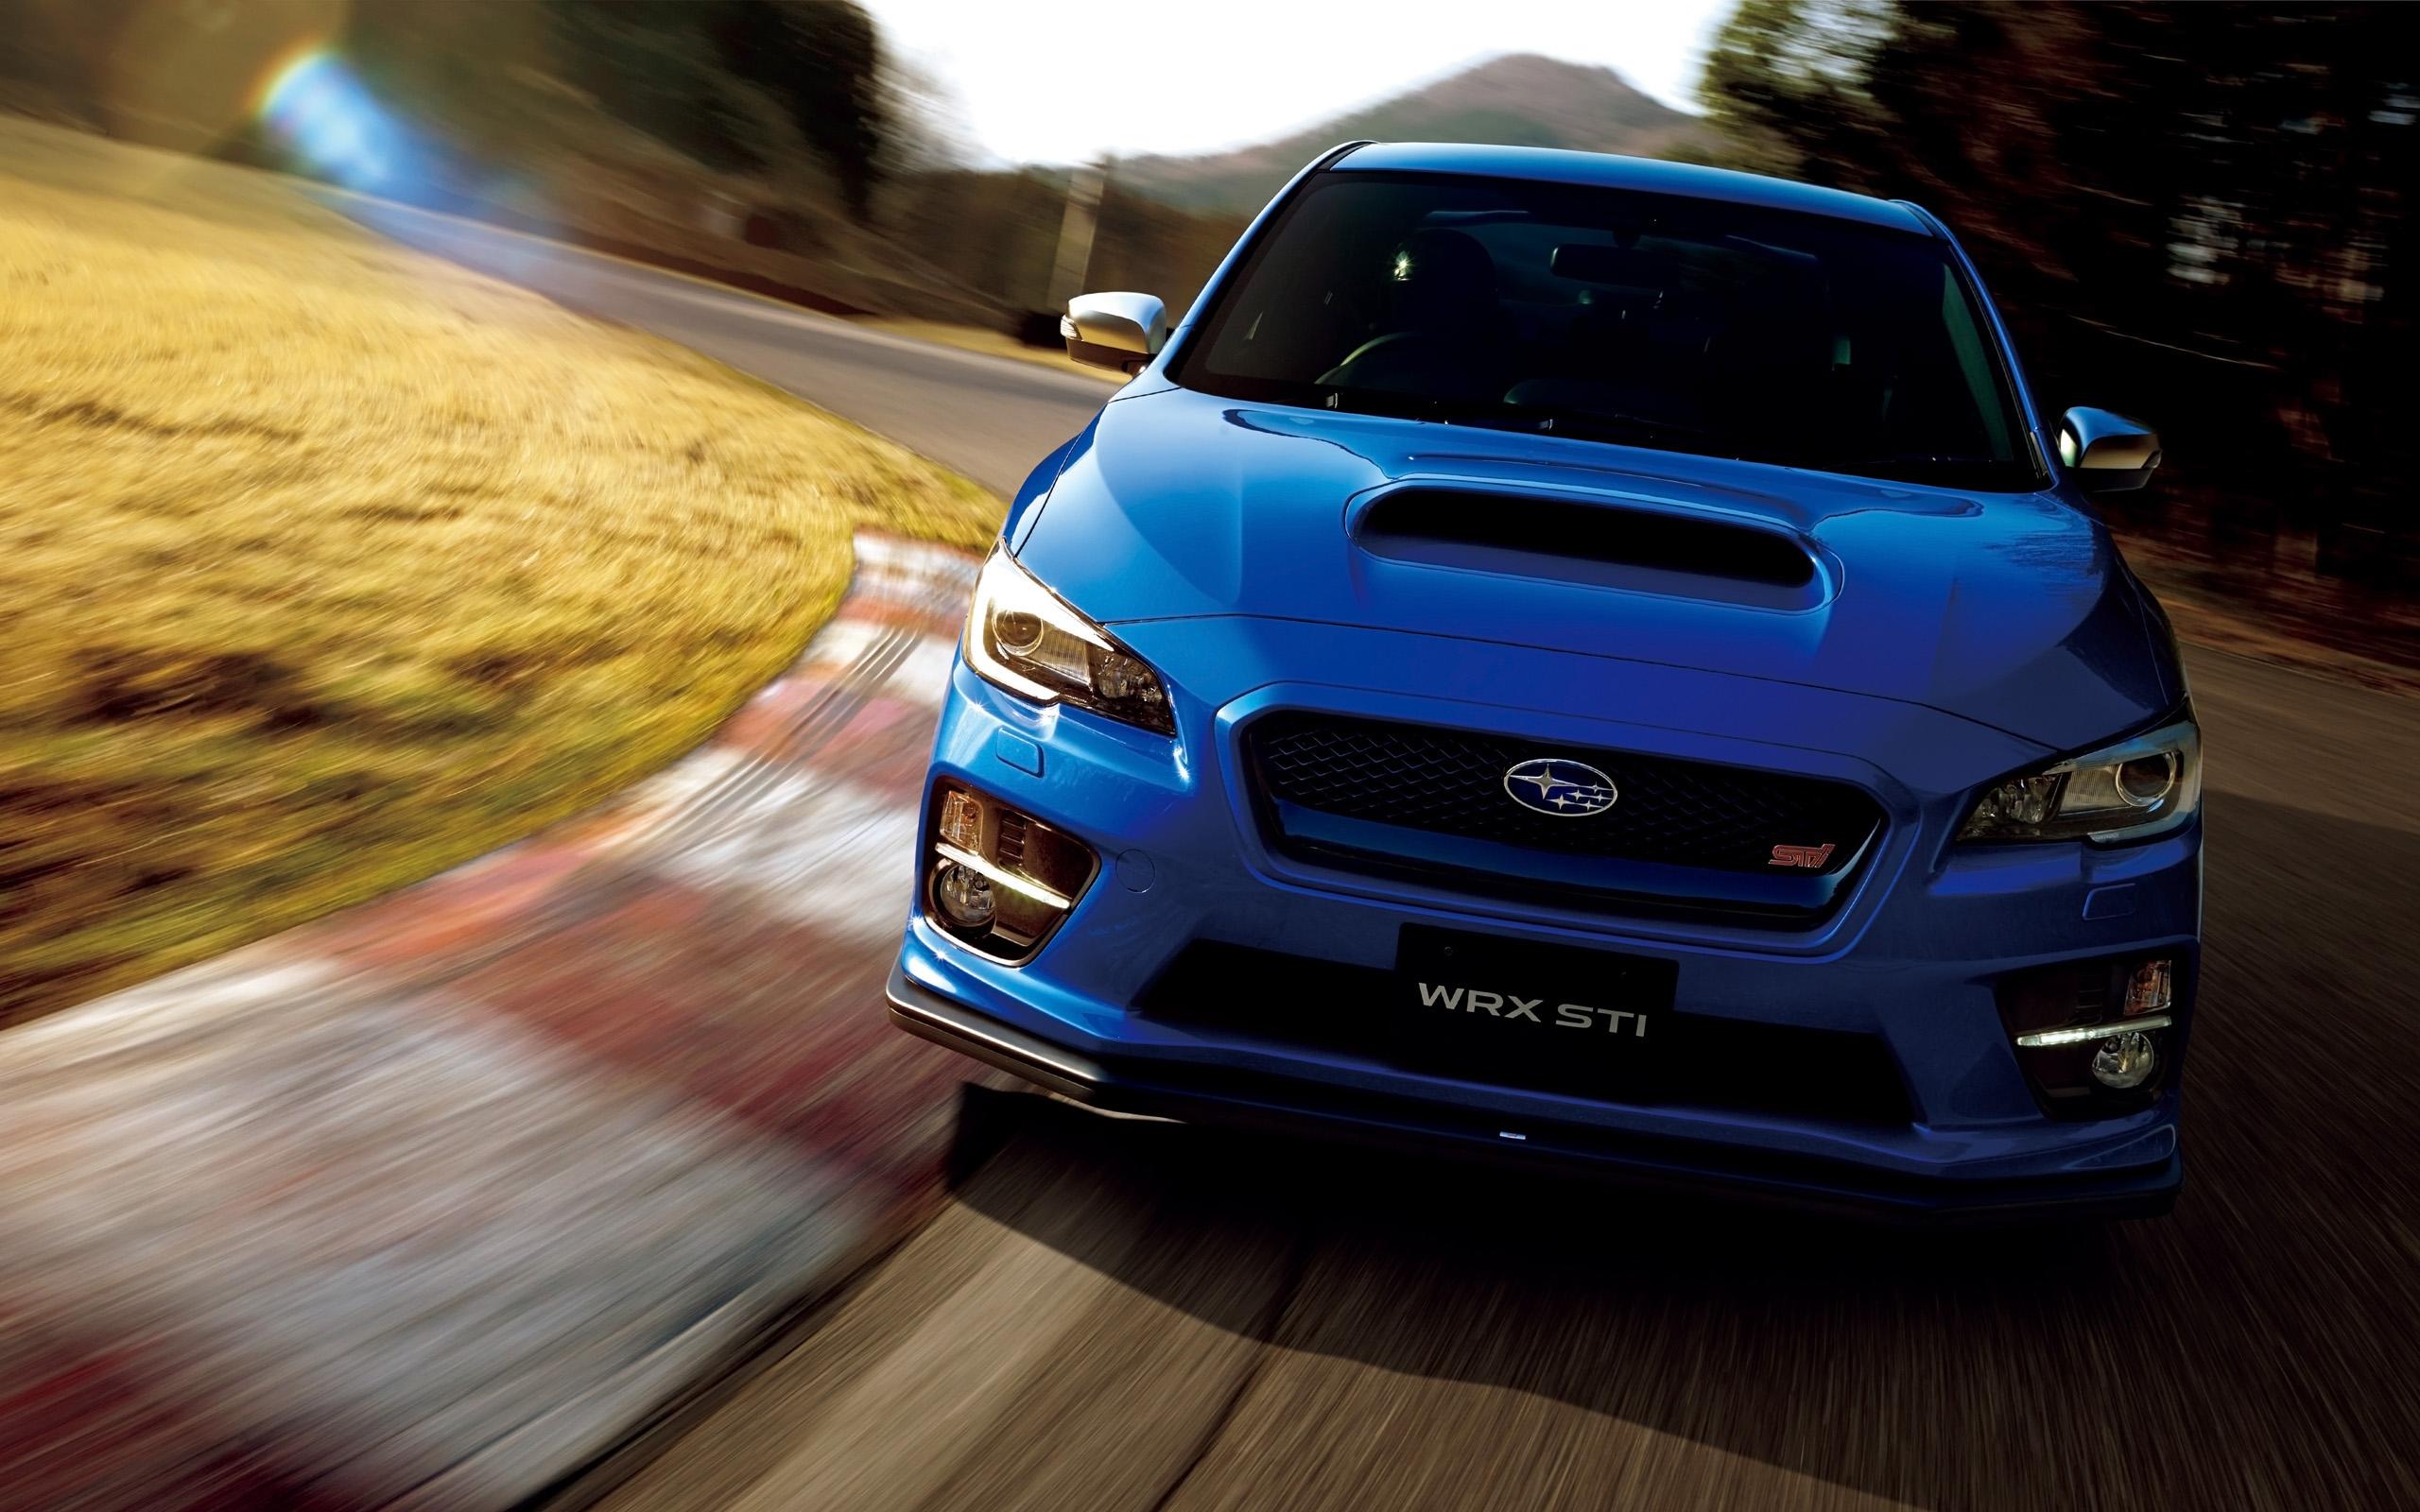 2015 Subaru WRX Wallpaper  WallpaperSafari